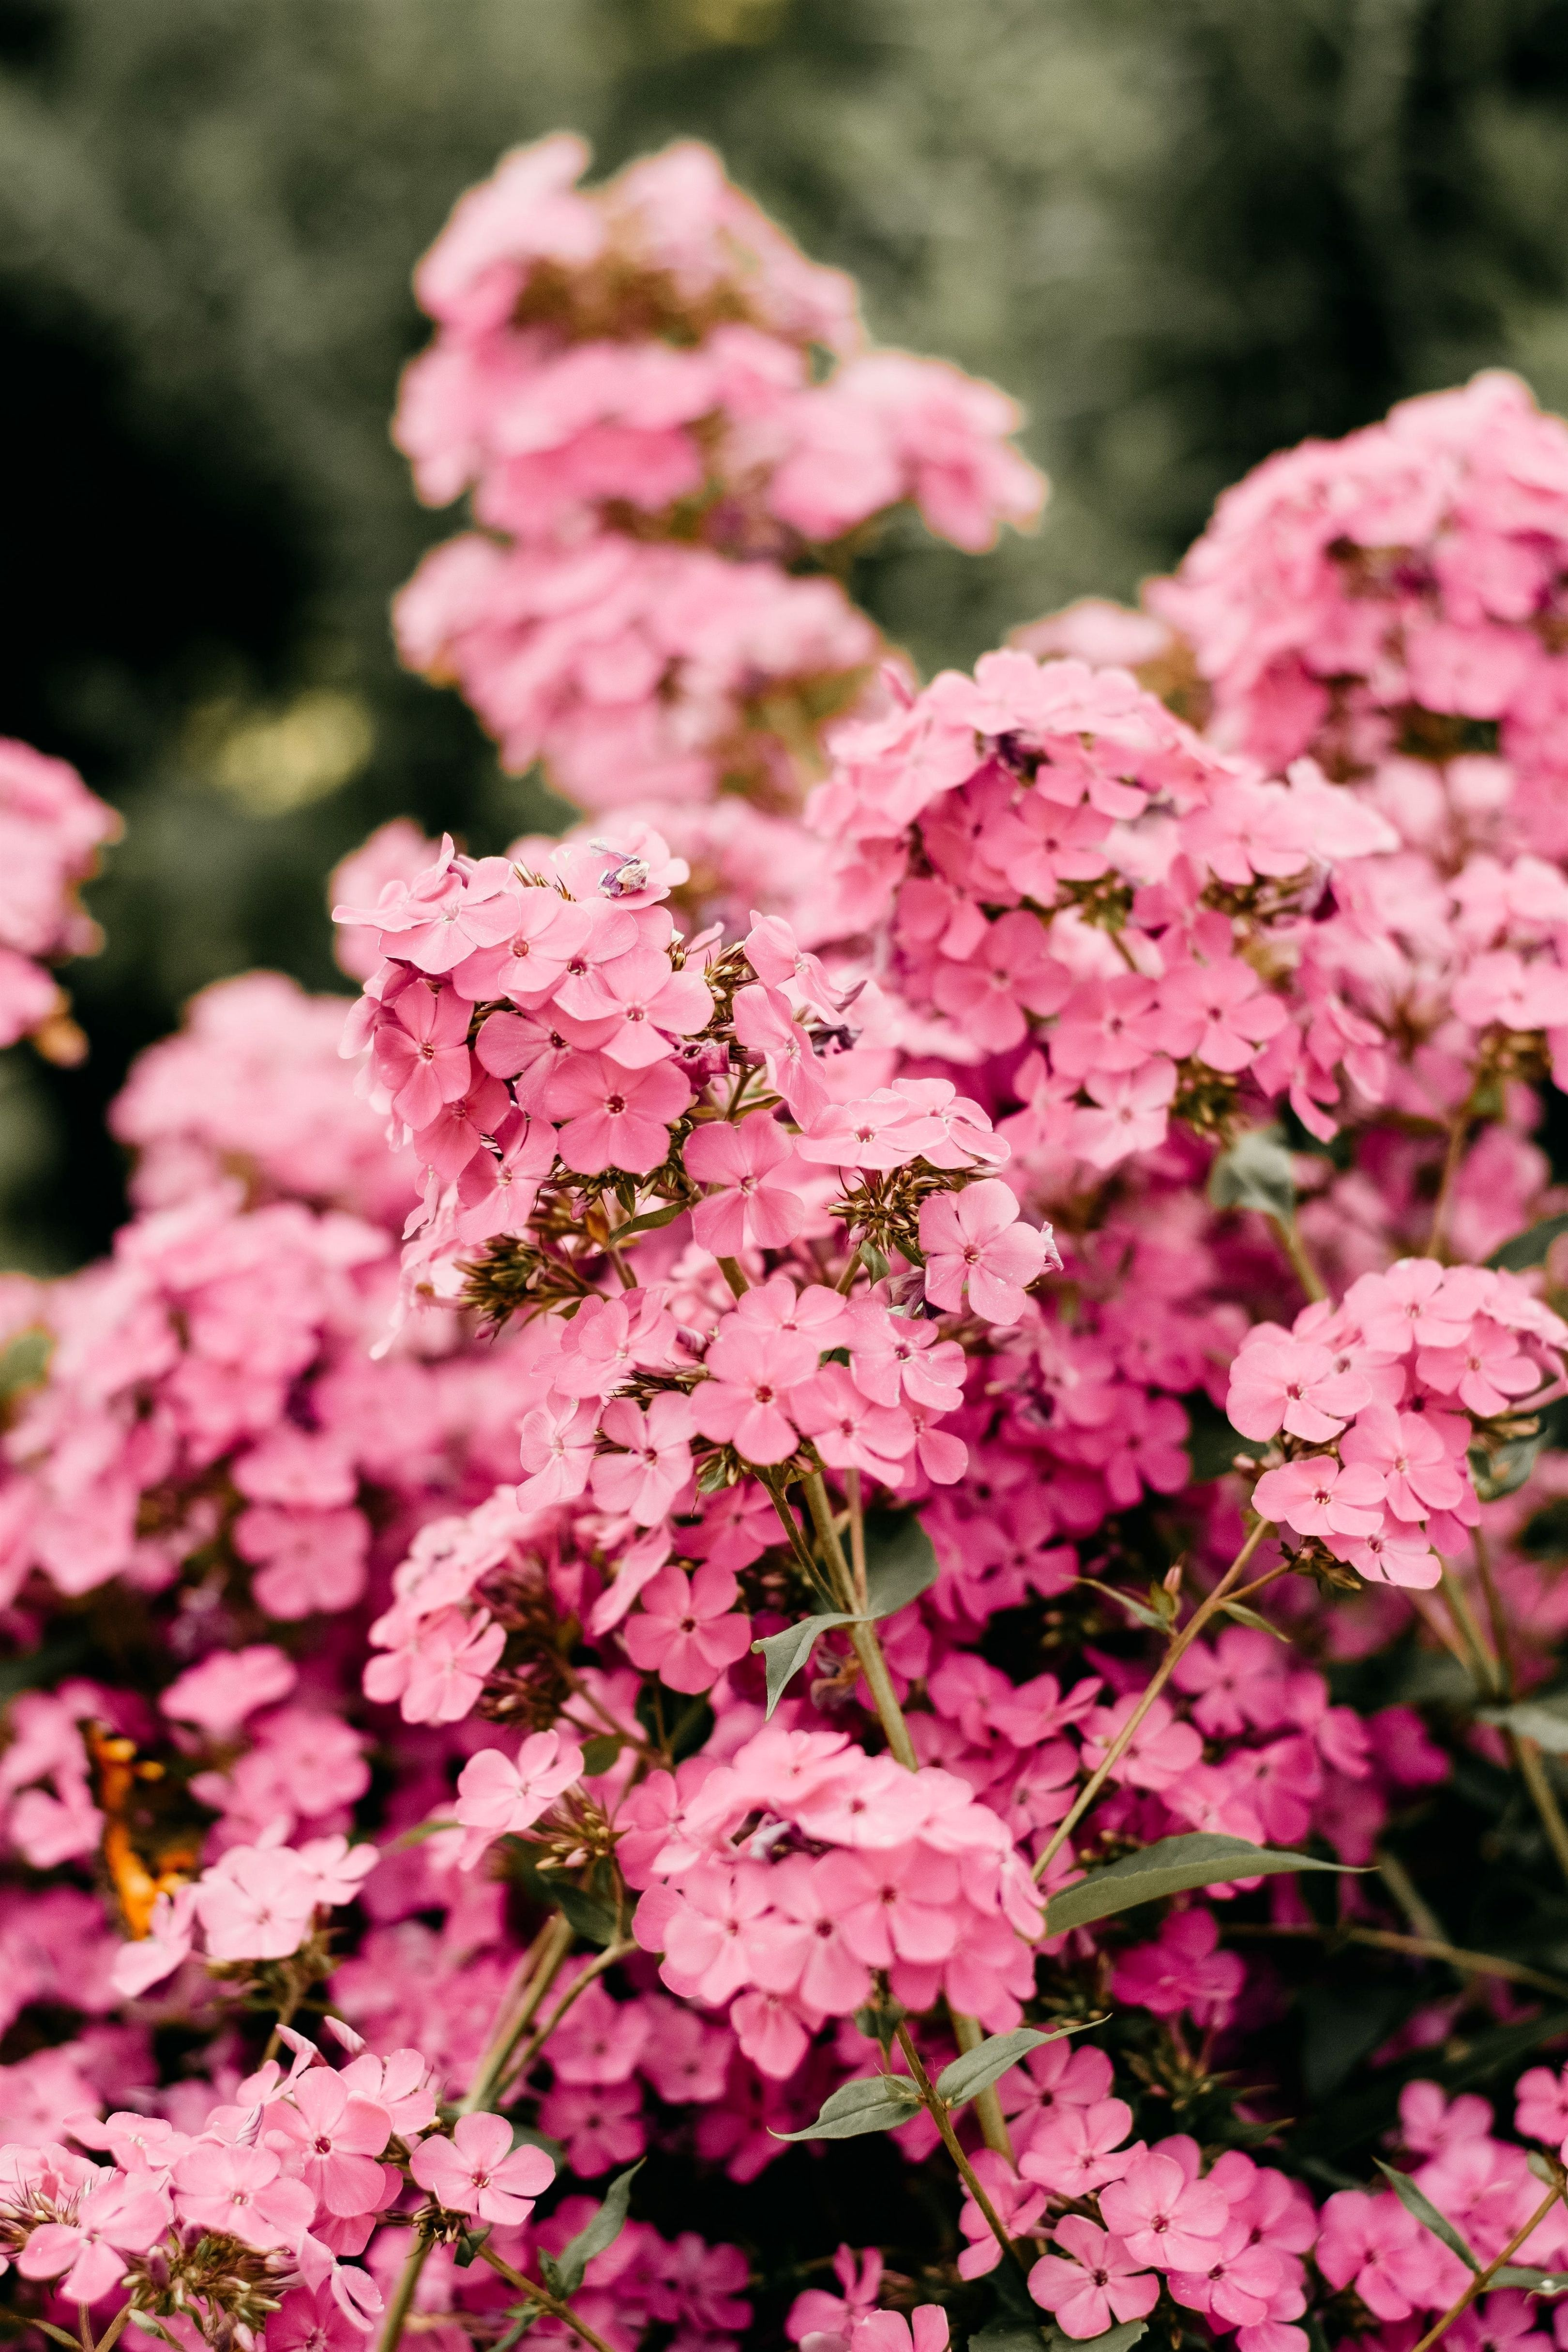 gardening tape_779_20200411103226_53 gardening australia